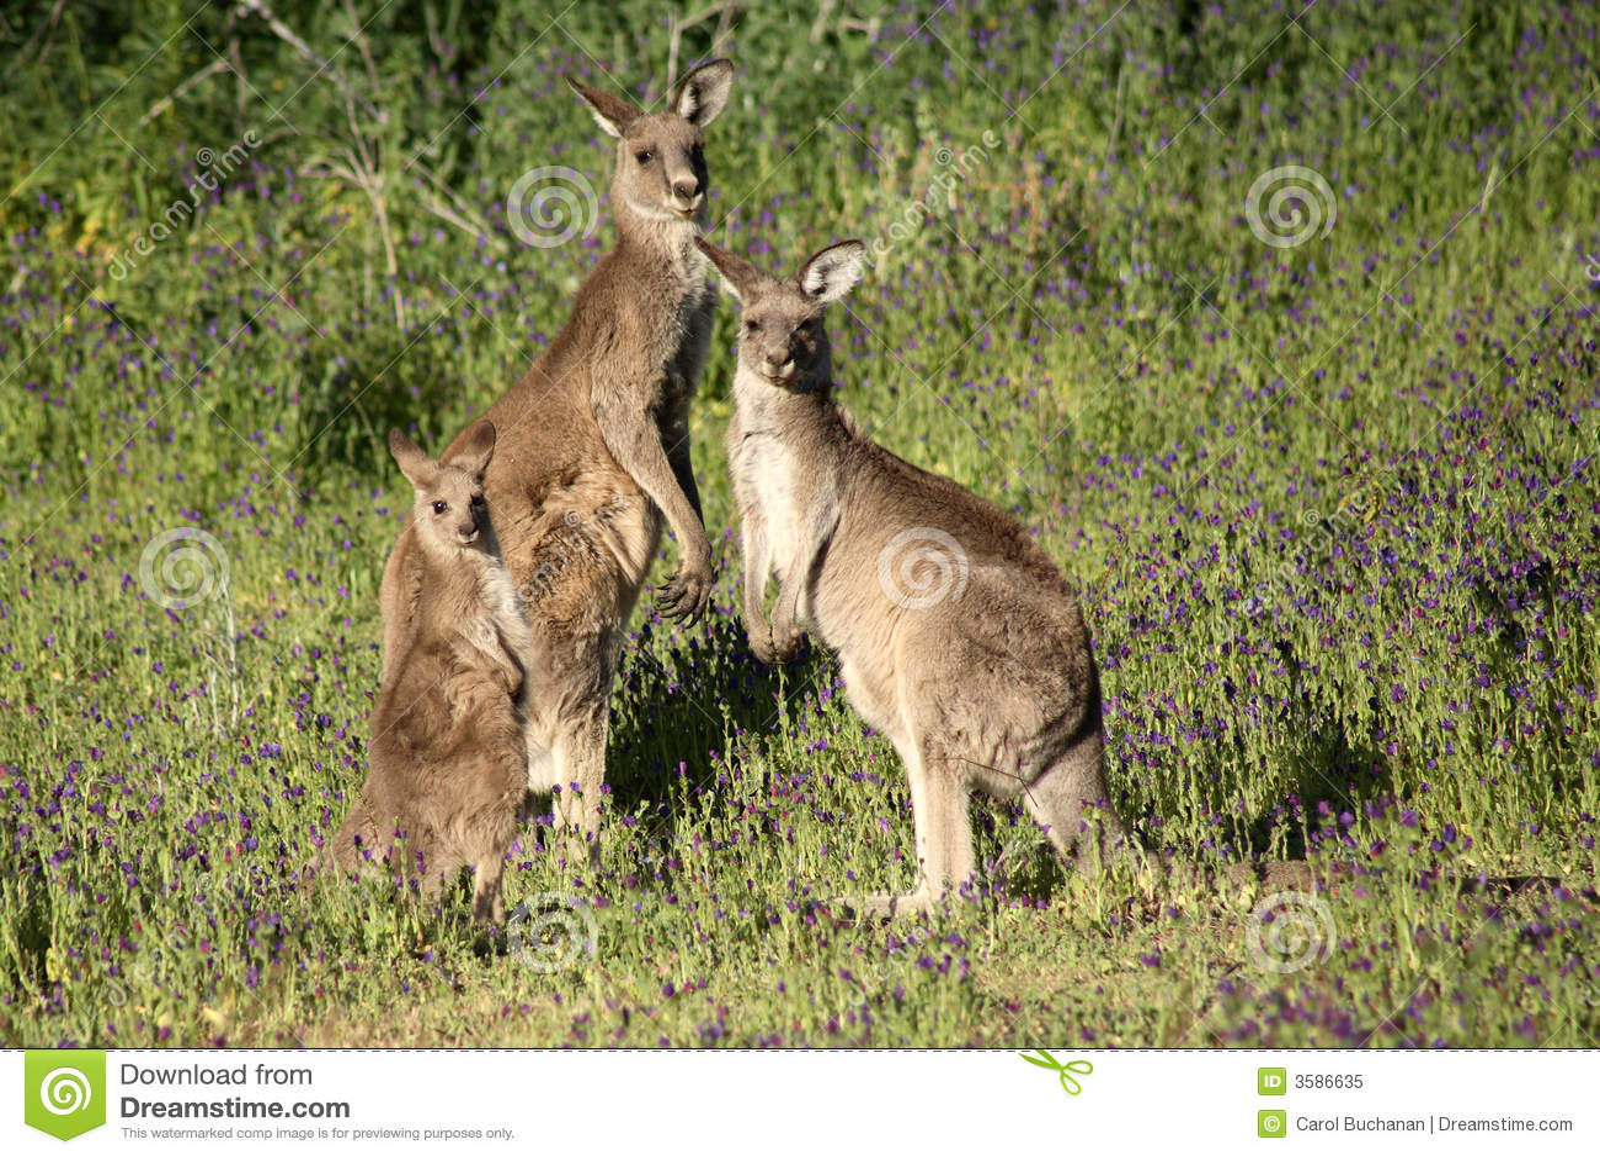 Kangaroo Joey Clipart